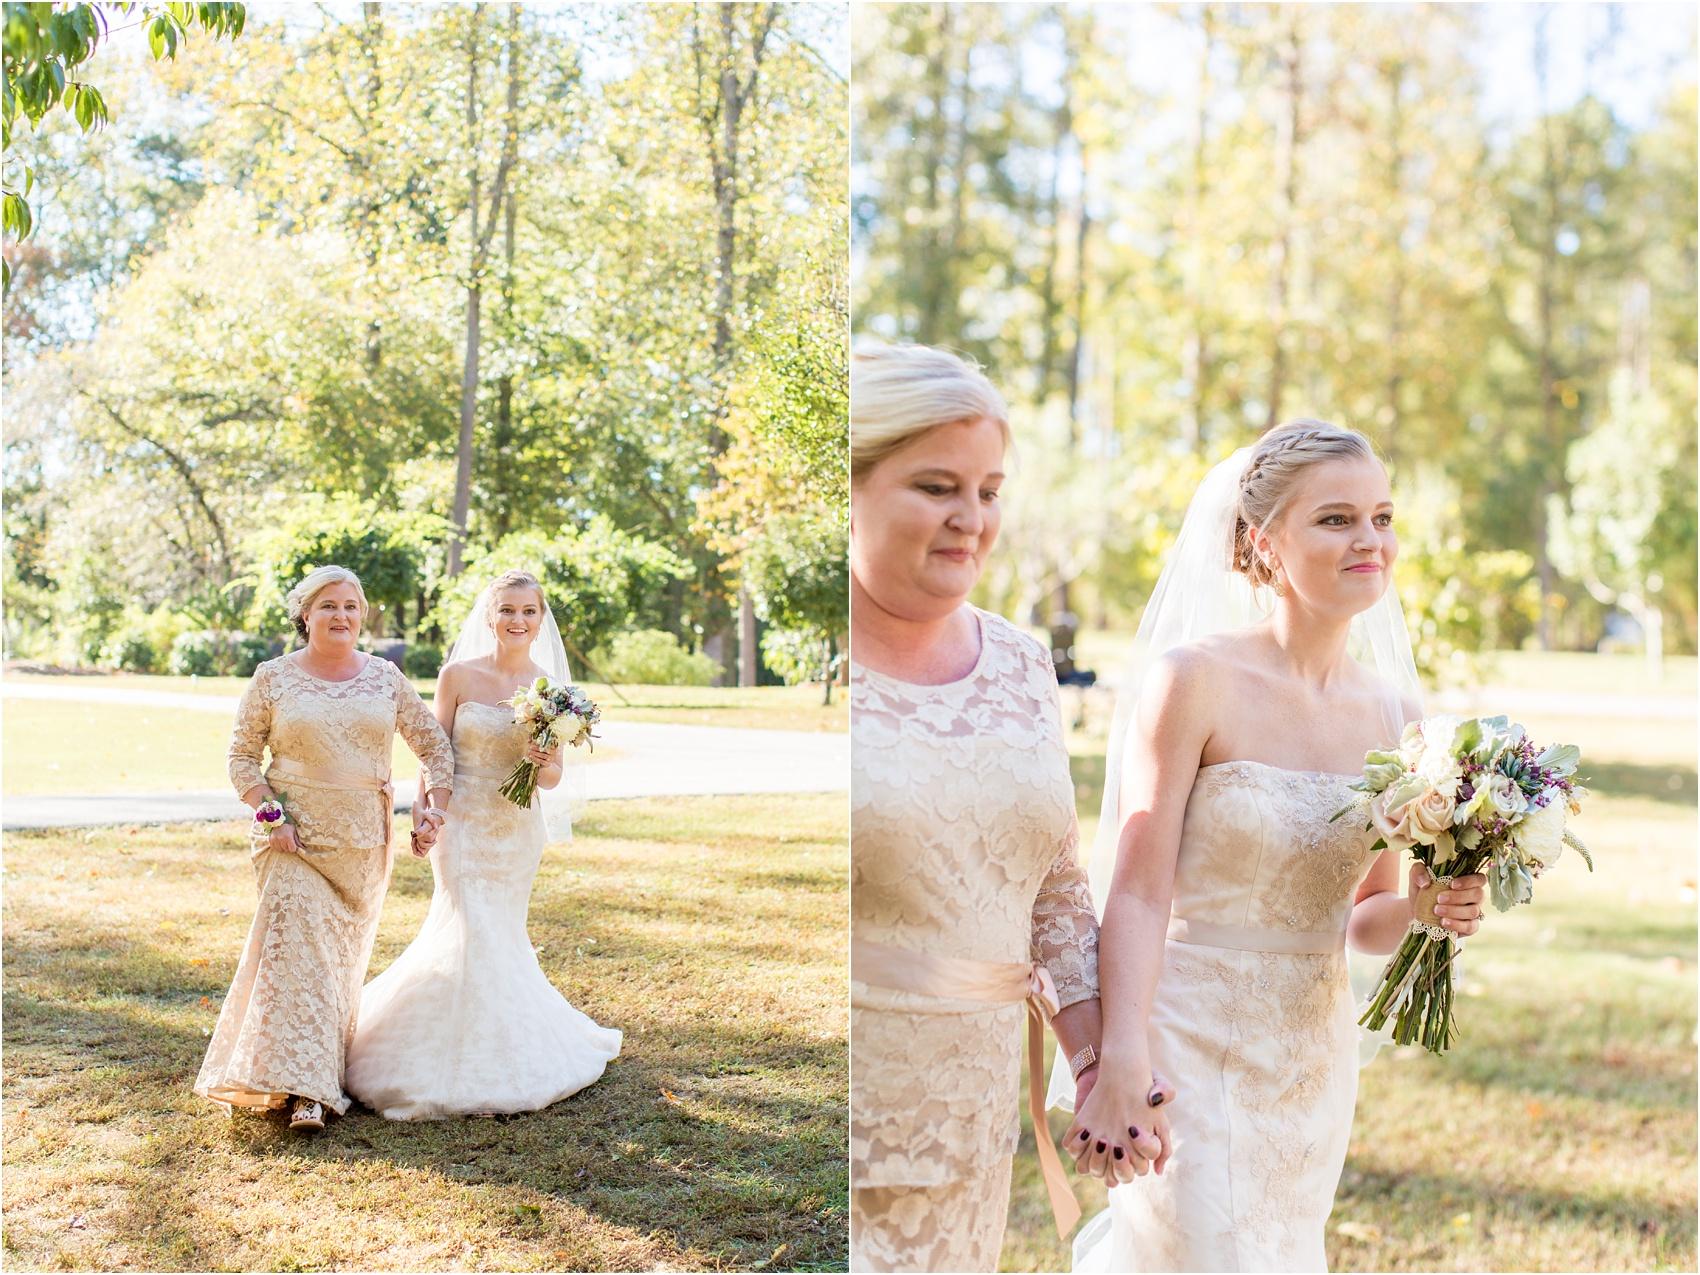 Savannah Eve Photography- Perkins Wedding- Blog-13.jpg